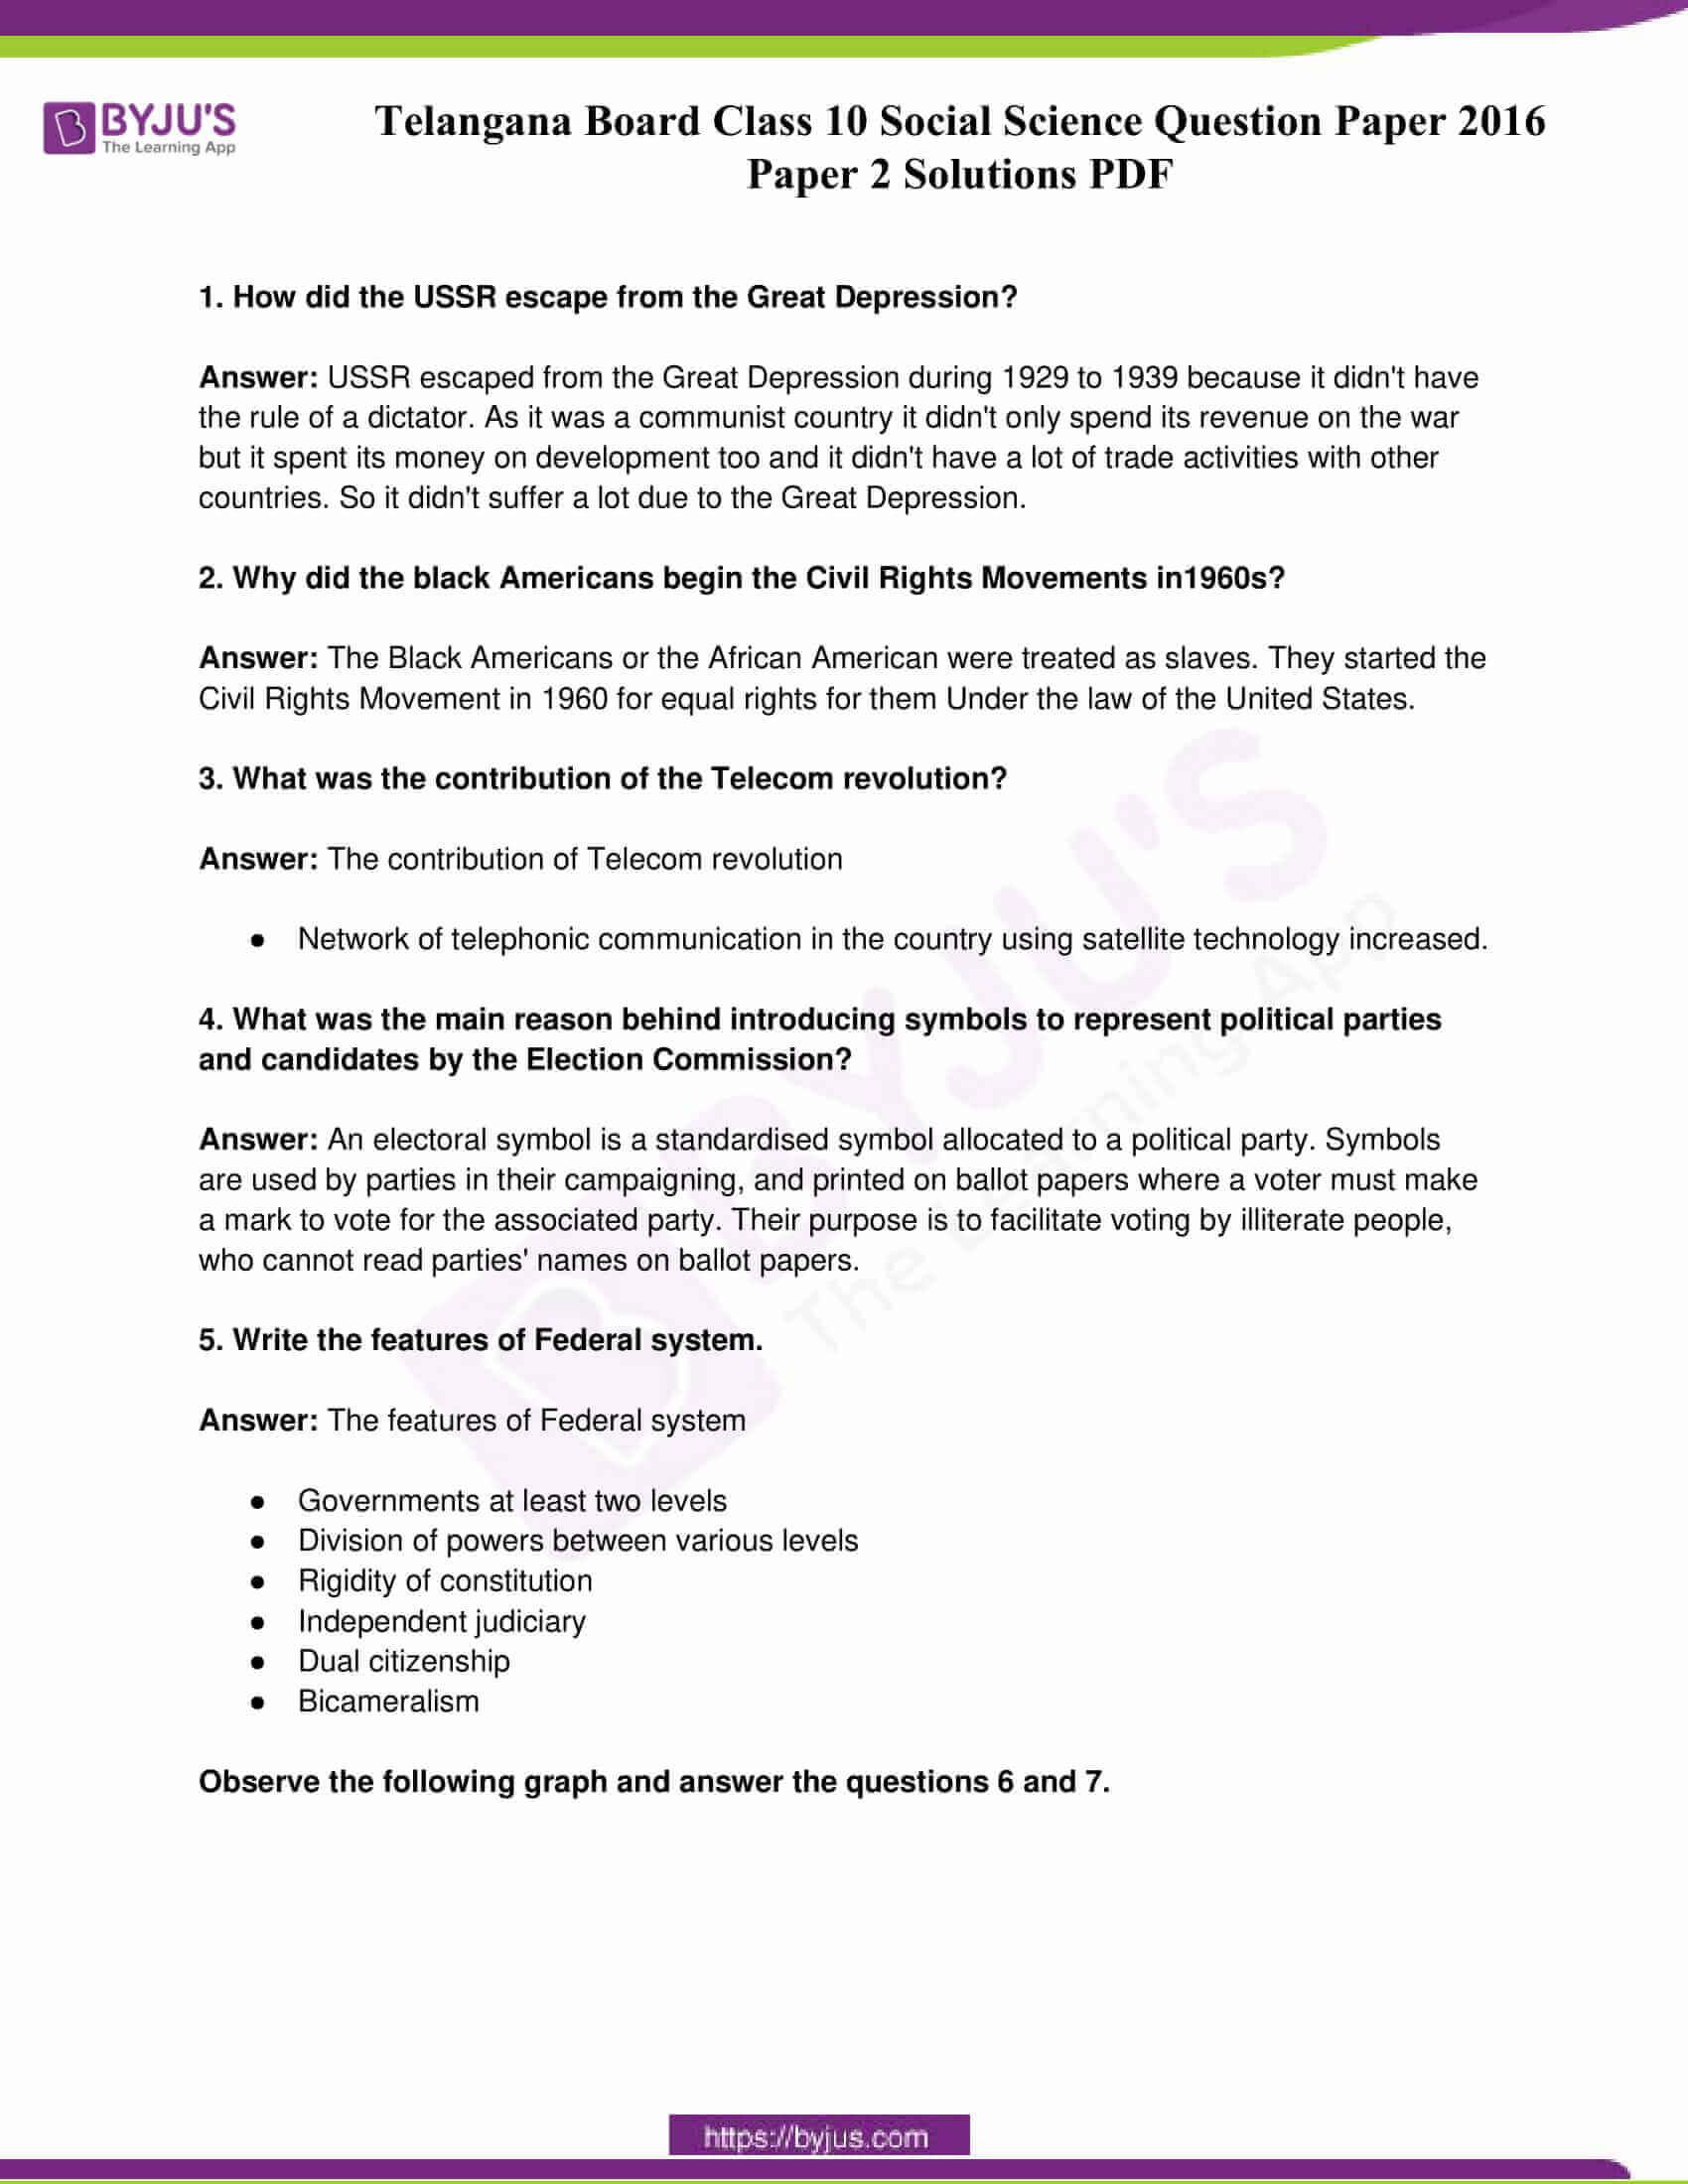 telangana board class 10 social science 2016 paper 2 solutions 1